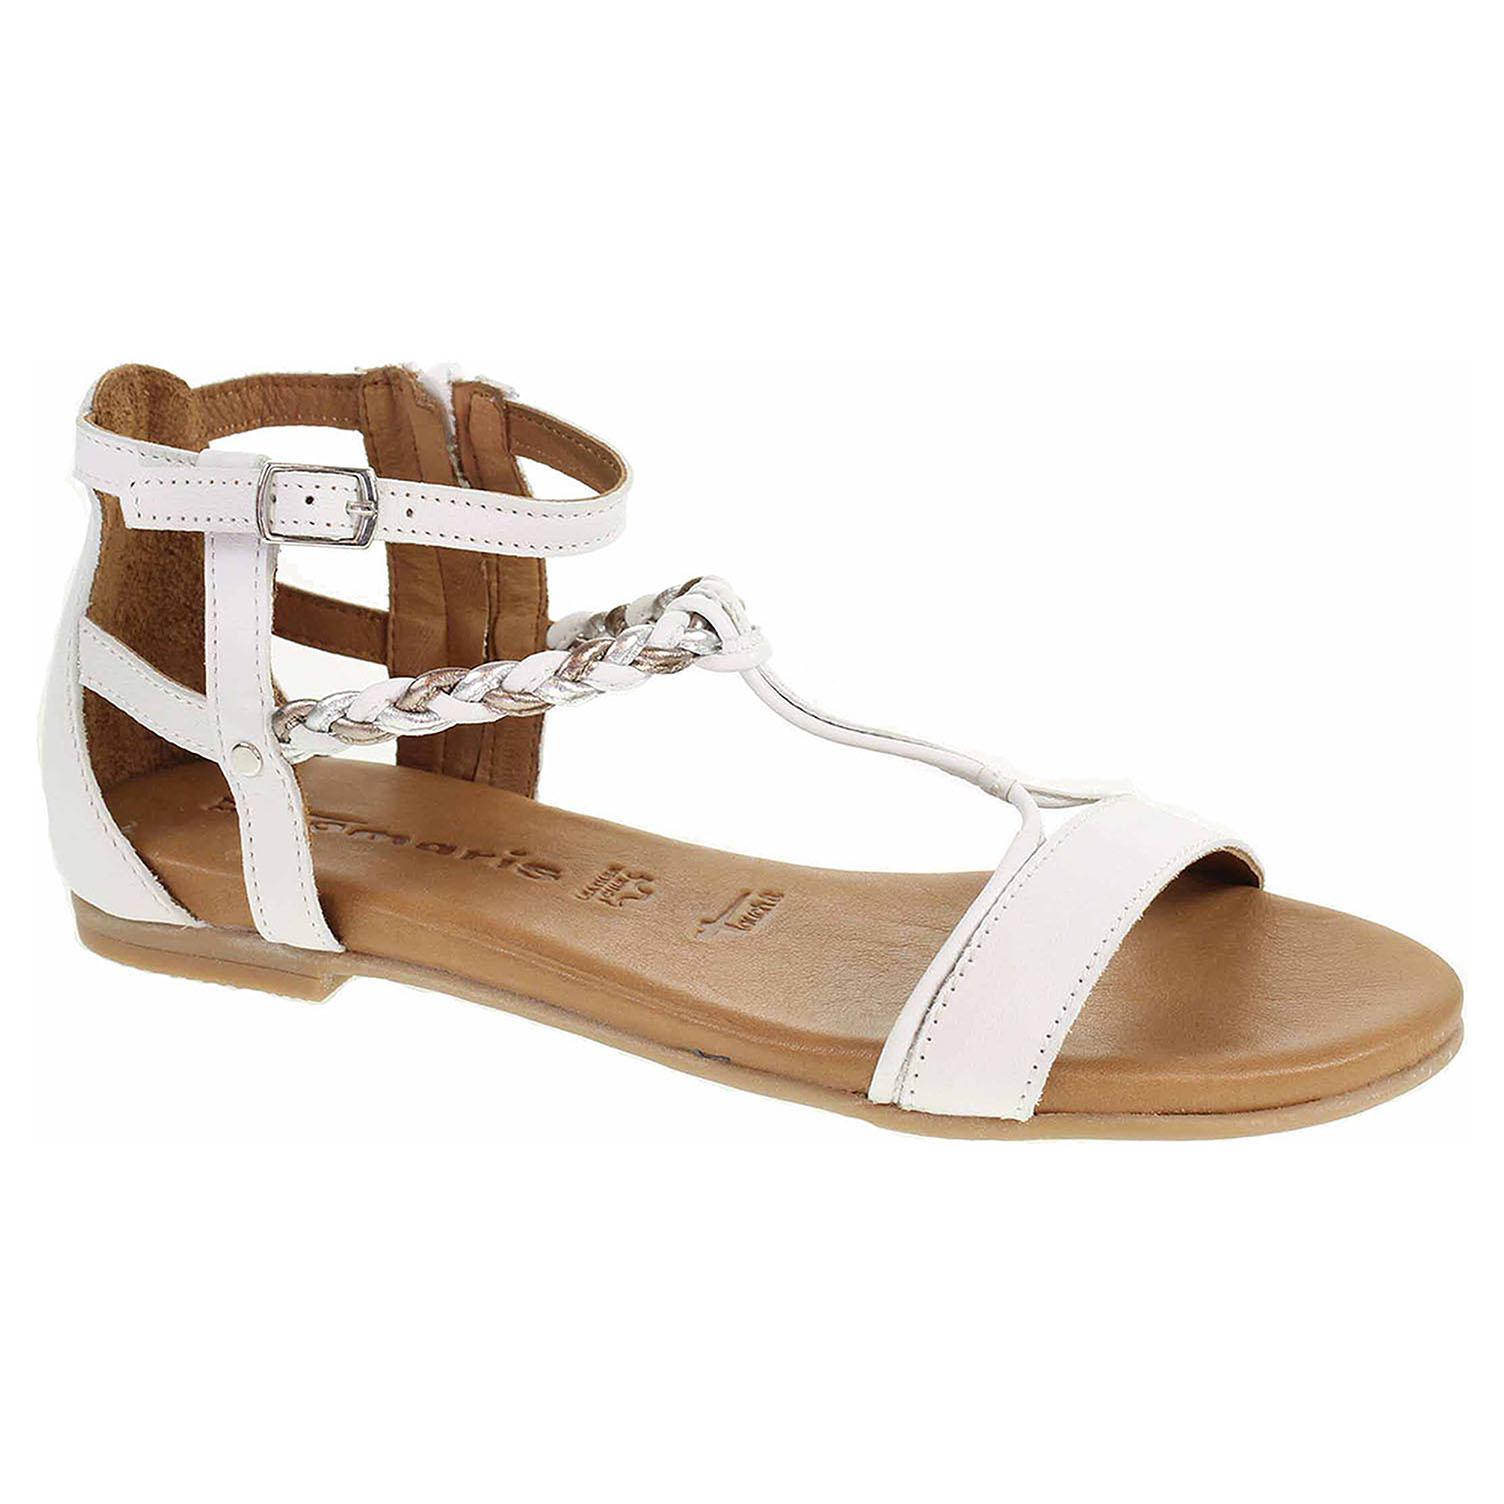 43dc83915fbf1 Ecco Dámské sandály Tamaris 1-28043-22 white comb 23801360